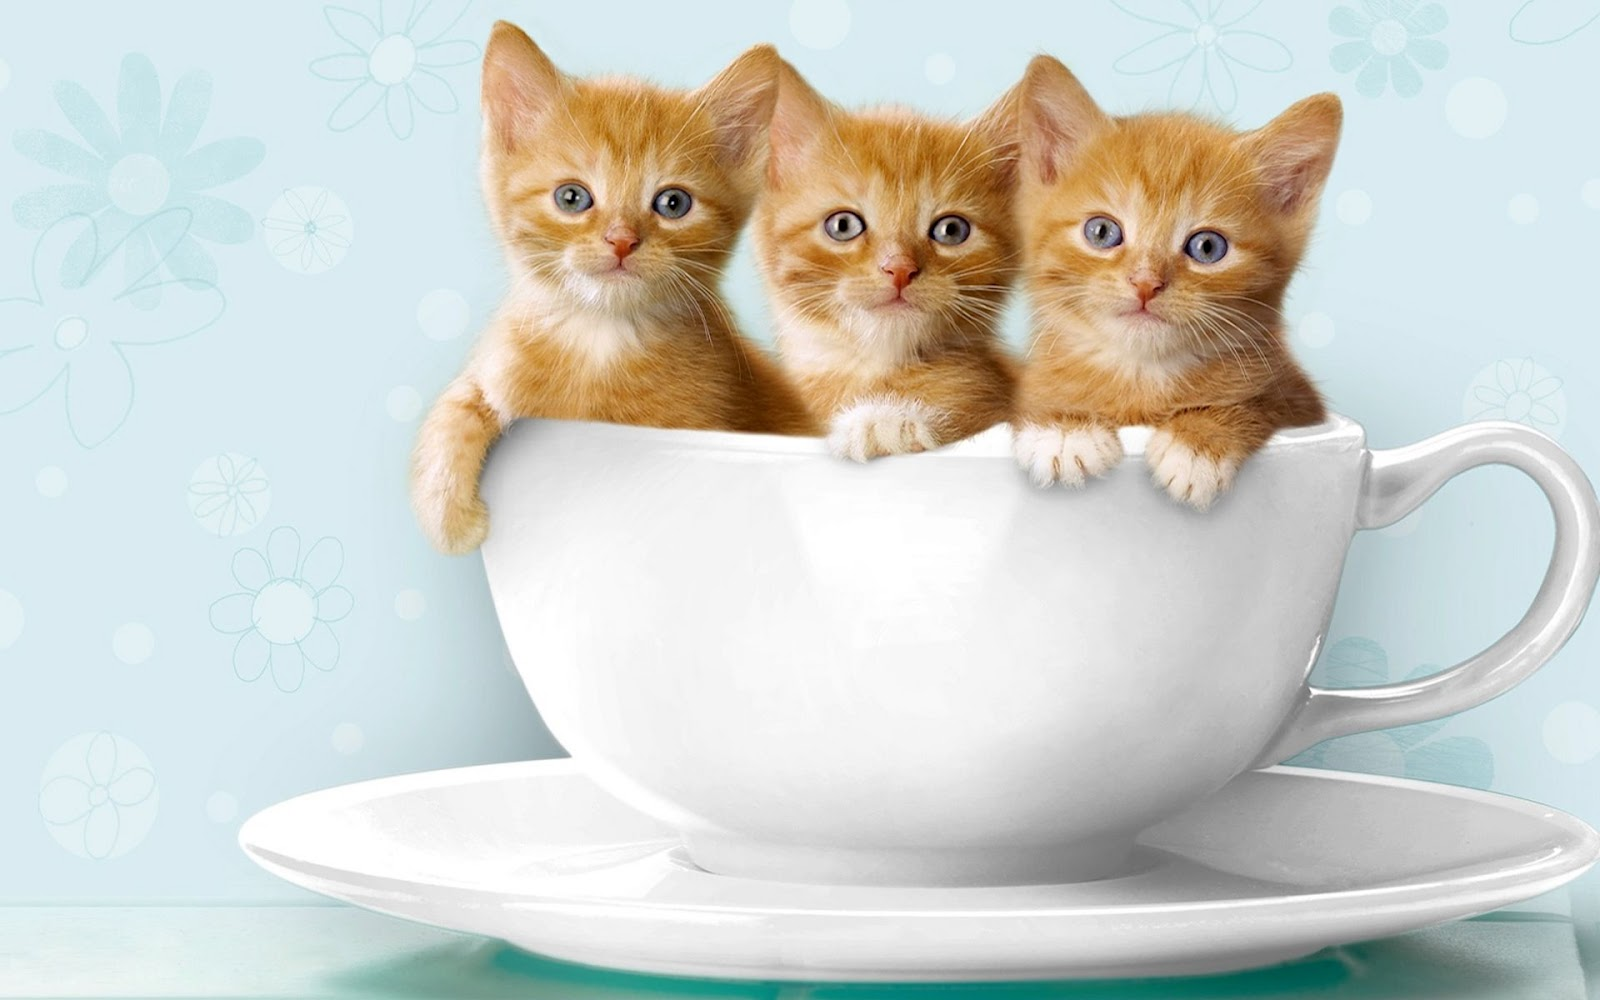 http://3.bp.blogspot.com/-ojpt5uO1vGo/T9Vw2RiPXoI/AAAAAAAACfk/LyL4-QteYUY/s1600/wallpaper+3+anak+kucing+di+dalam+cangkir.jpg